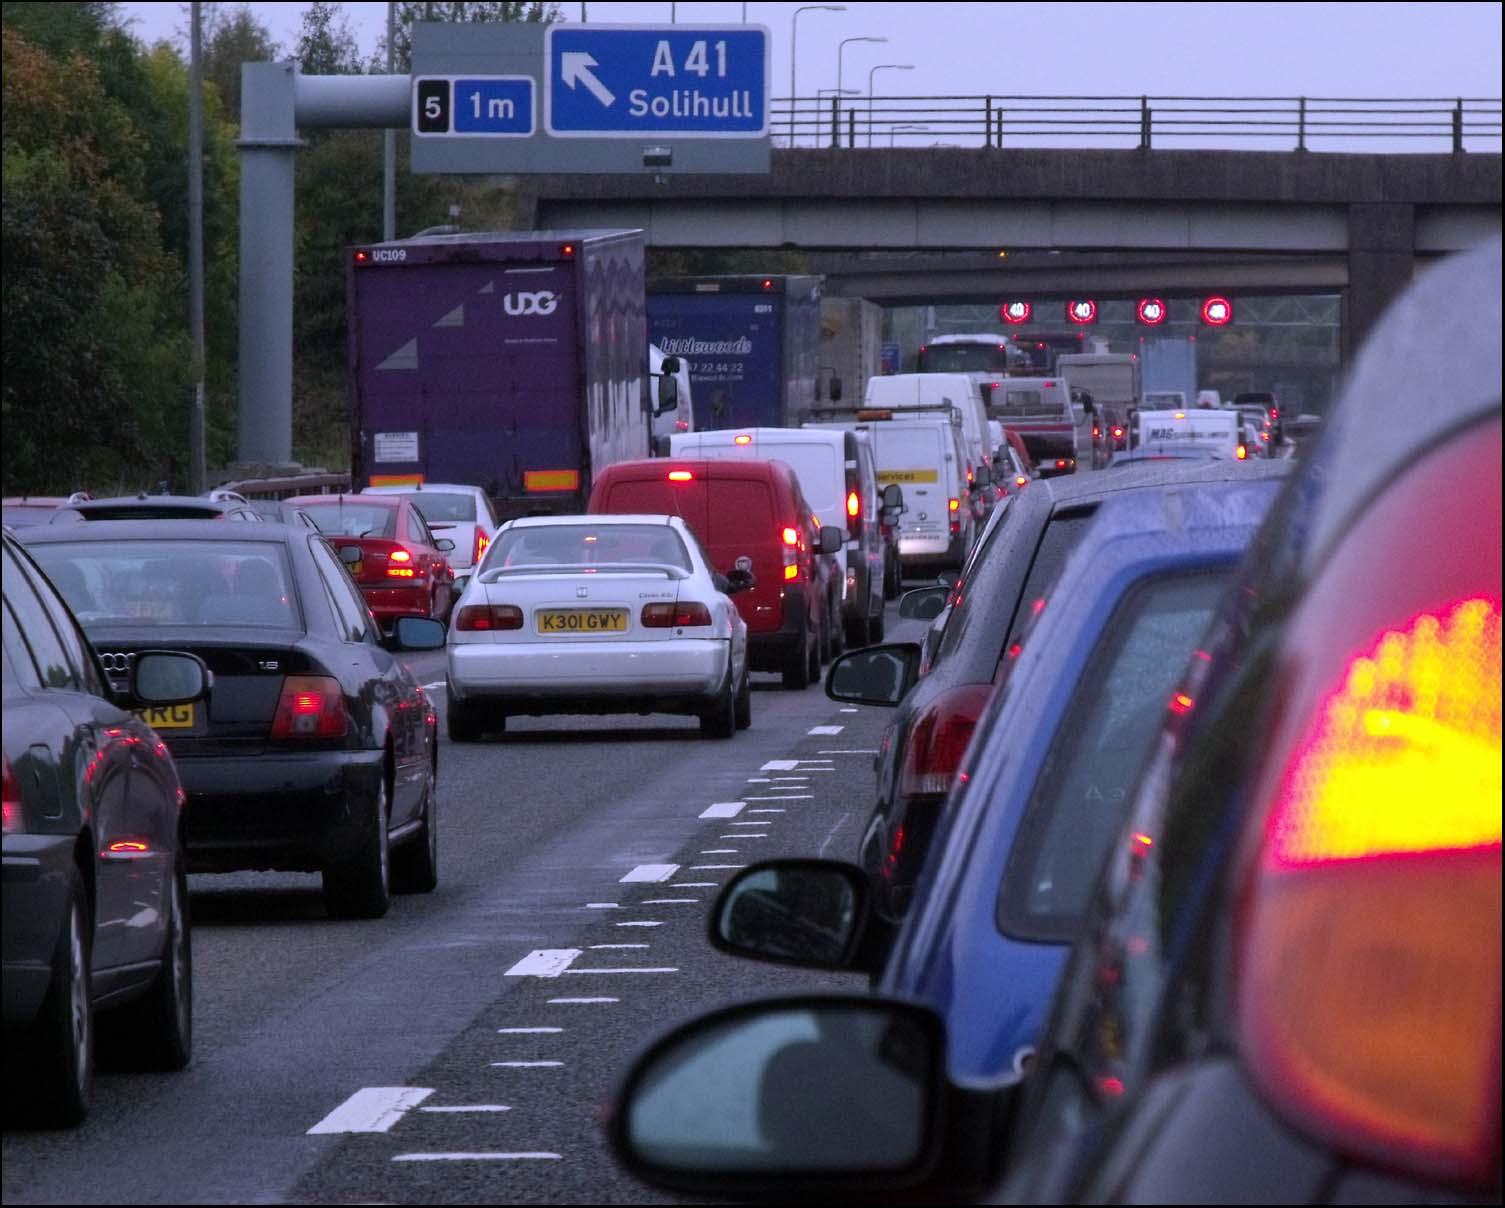 M42,motorway,car,park,stop,stopped,traffic,heavy,cars,Solihul,birmingham,england,UK,40,mph,40mpg,variable,speed,limit,section,J5,J6,junction,5,6,junction5,camera,Gatso,365days,west,midlands,britain,GB,europe,english,auto,autos,automobile,automobiles,vehicle,vehicles,hotpix!,hotpix.rocketmail.com,hotpixuk.rocketmail.com,contact.tony.smith.gmail.com,tony.smith.gmail.com,tonys@miscs.com,tony.smith@mis-ams.com